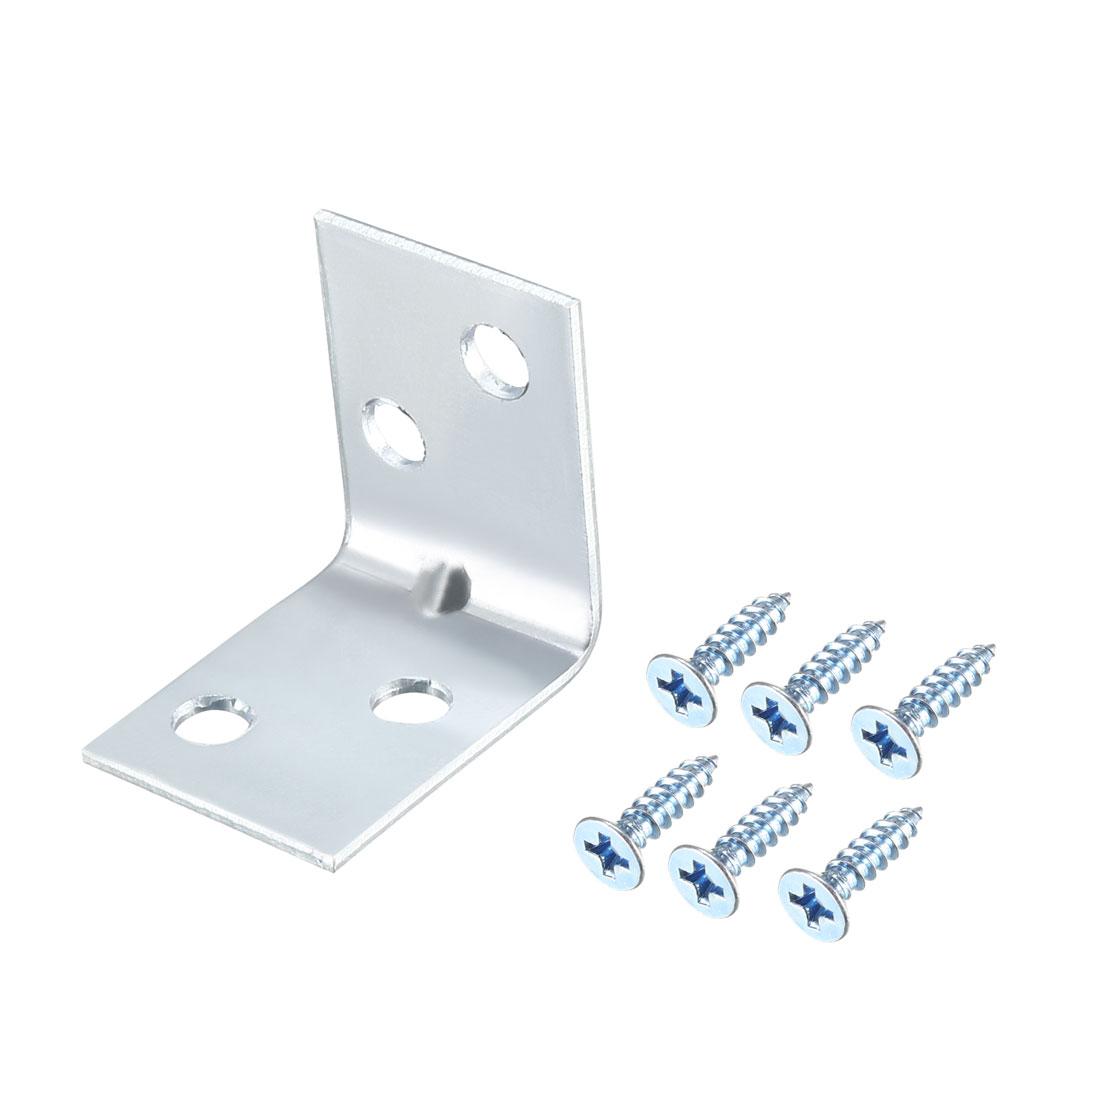 Corner Brace, 26mm x 26mm Zinc Plated Joint Right Angle Bracket w Screws, 20 Pcs